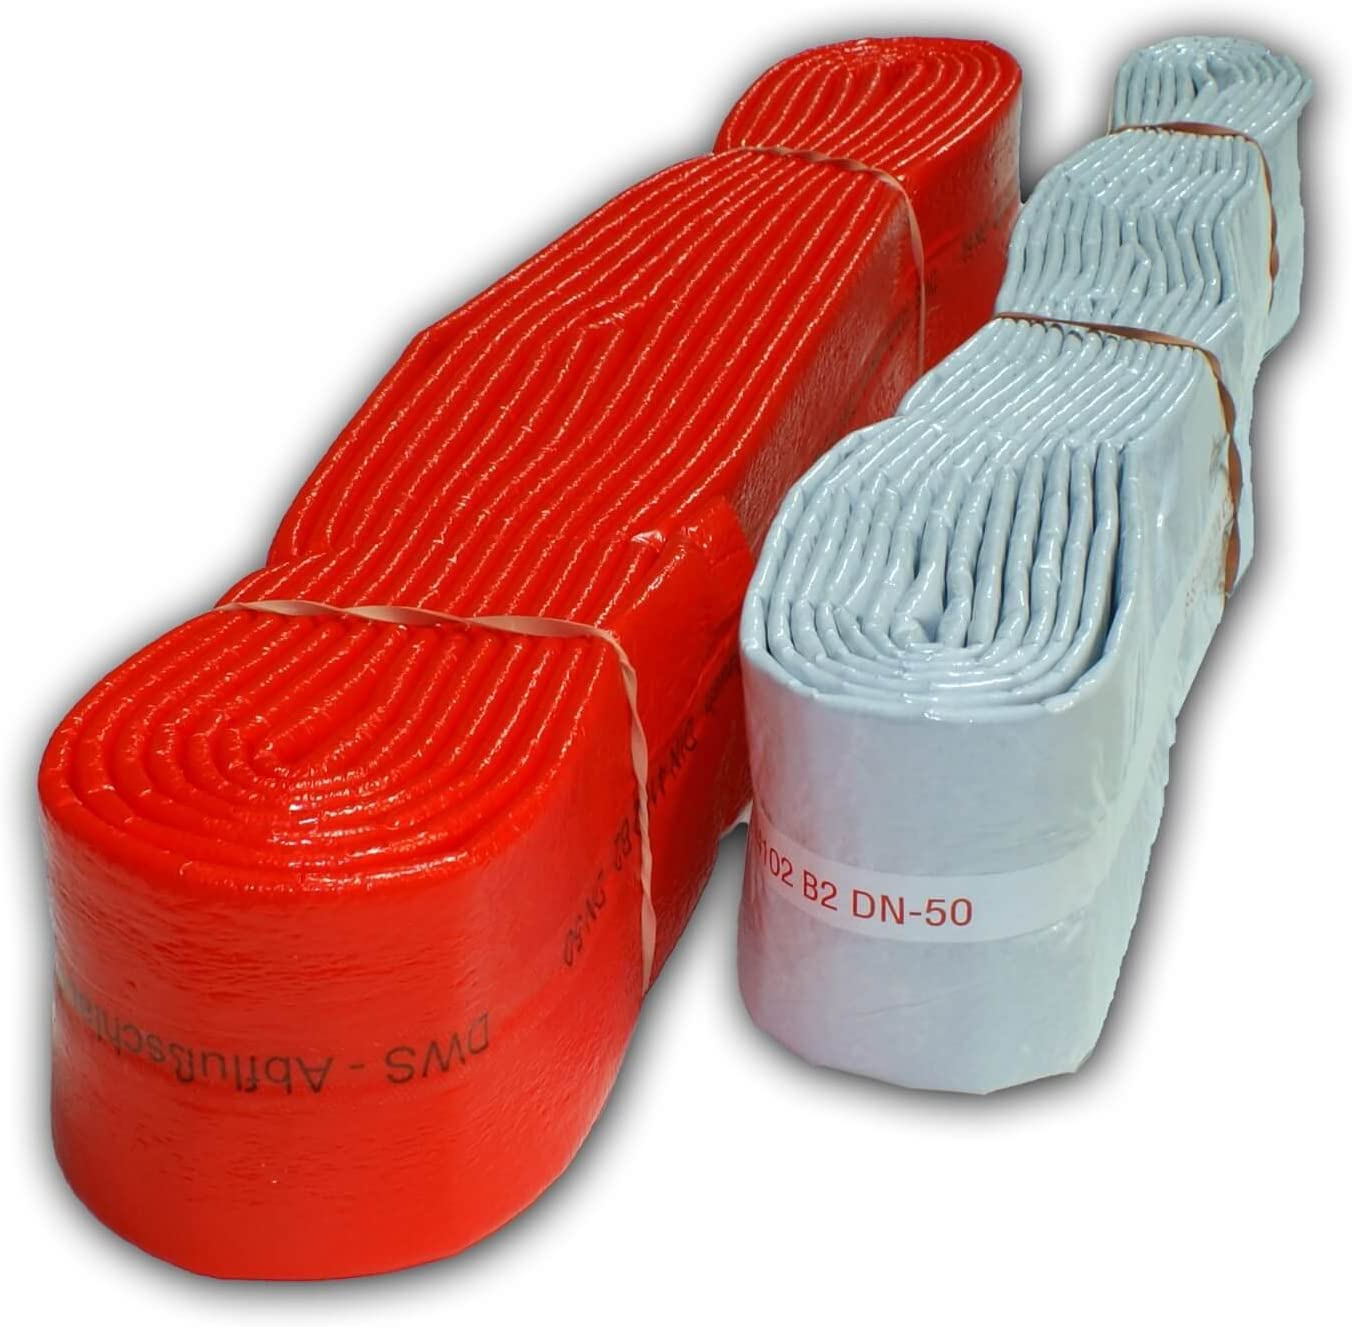 PE Isolierschlauch Schutzschlauch 15m D/ämmschlauch DN 50 mm rot Schallschutz HT KG Rohr Kanalrohr Isolierung Rohrisolierung D/ämmung Rohrd/ämmung